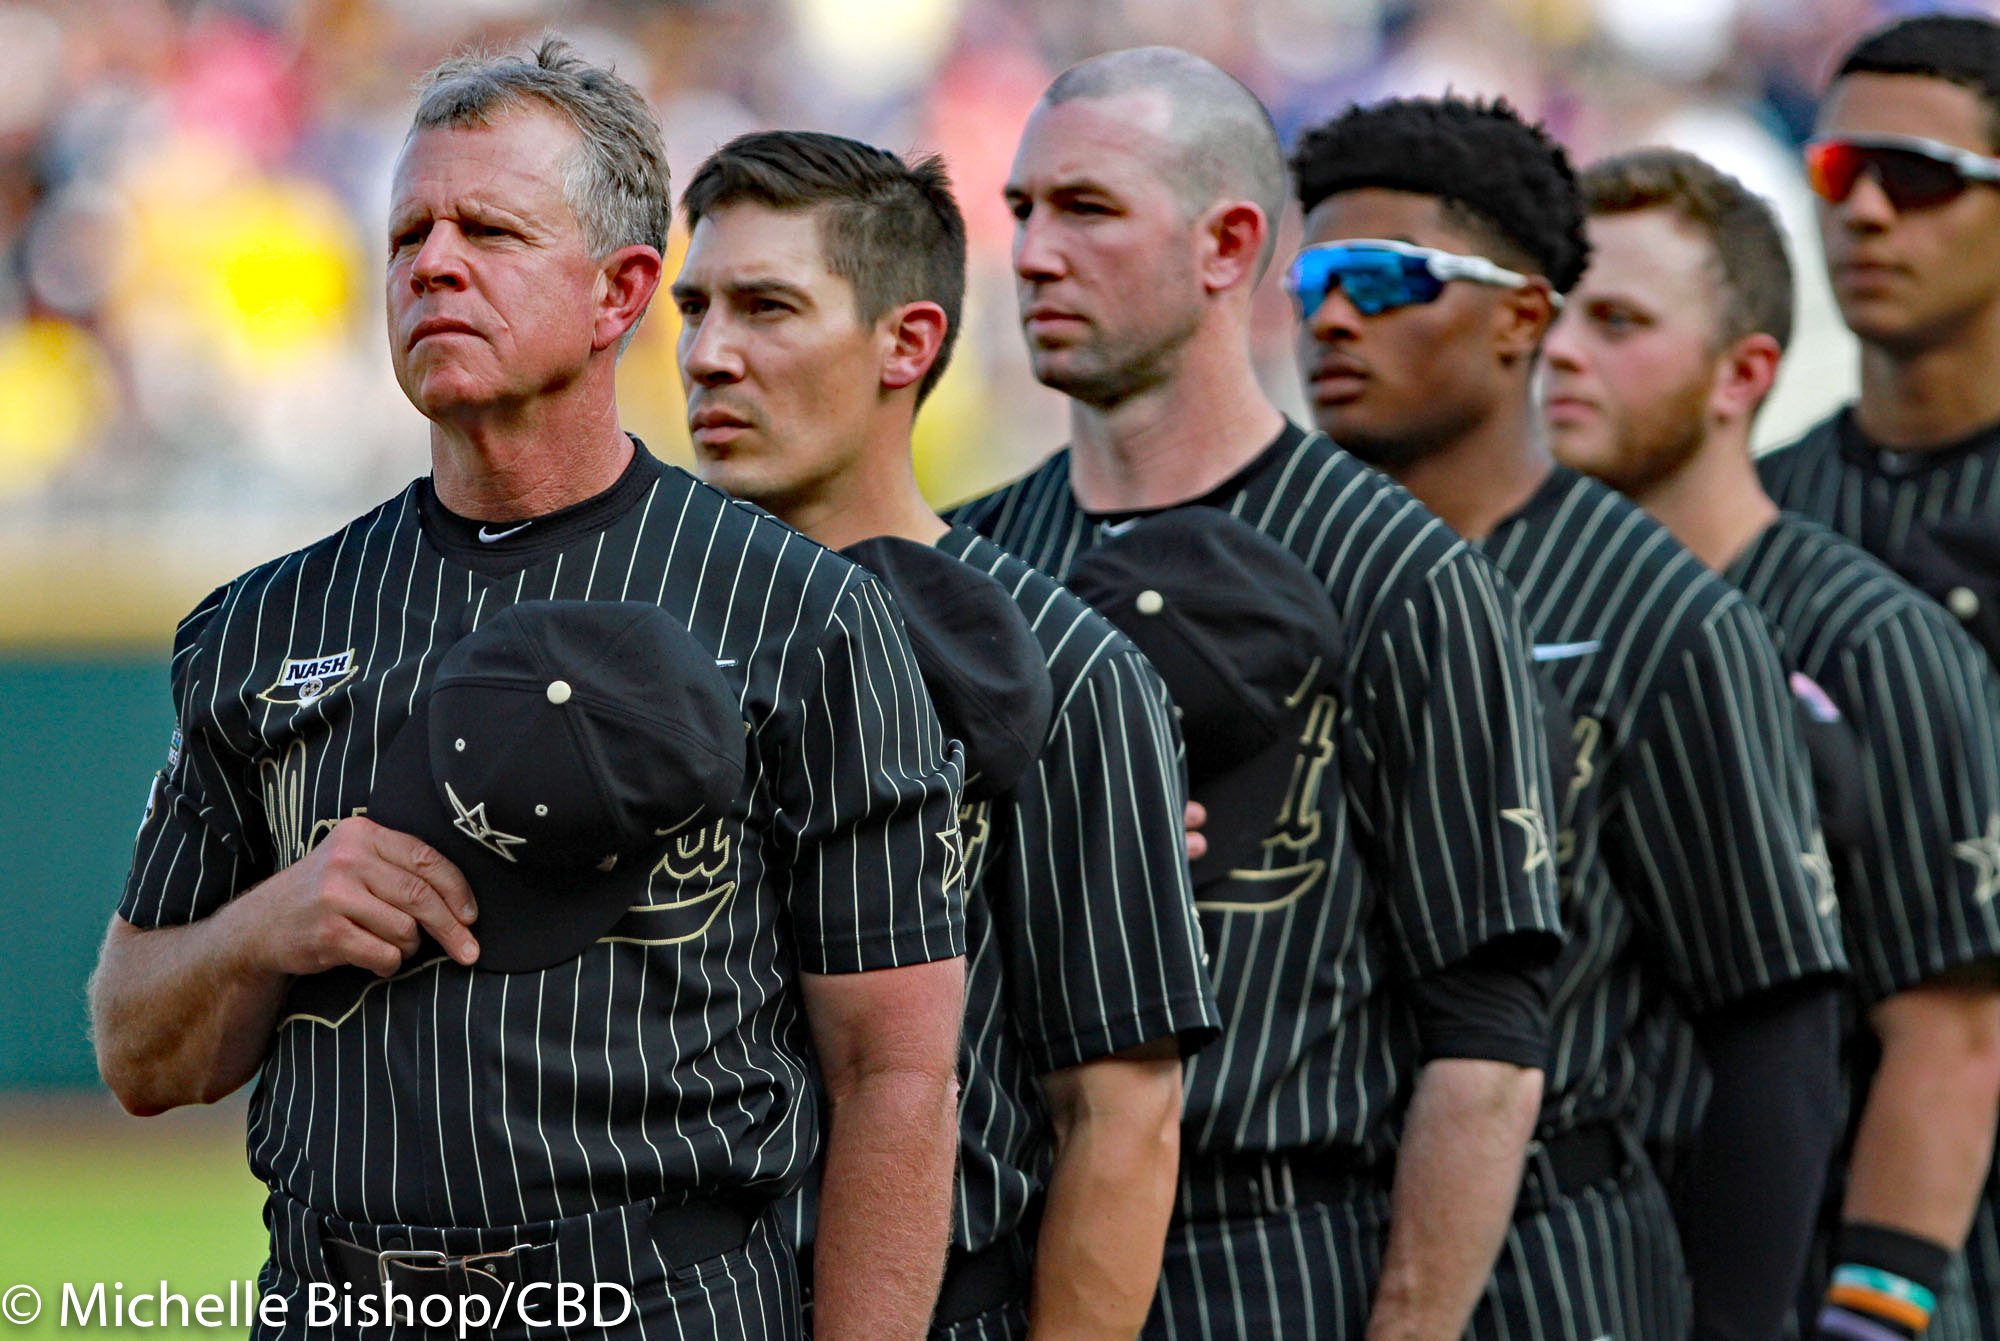 2019 CWS Championship Series: Vanderbilt defeats Michigan 8-2 to win National Title